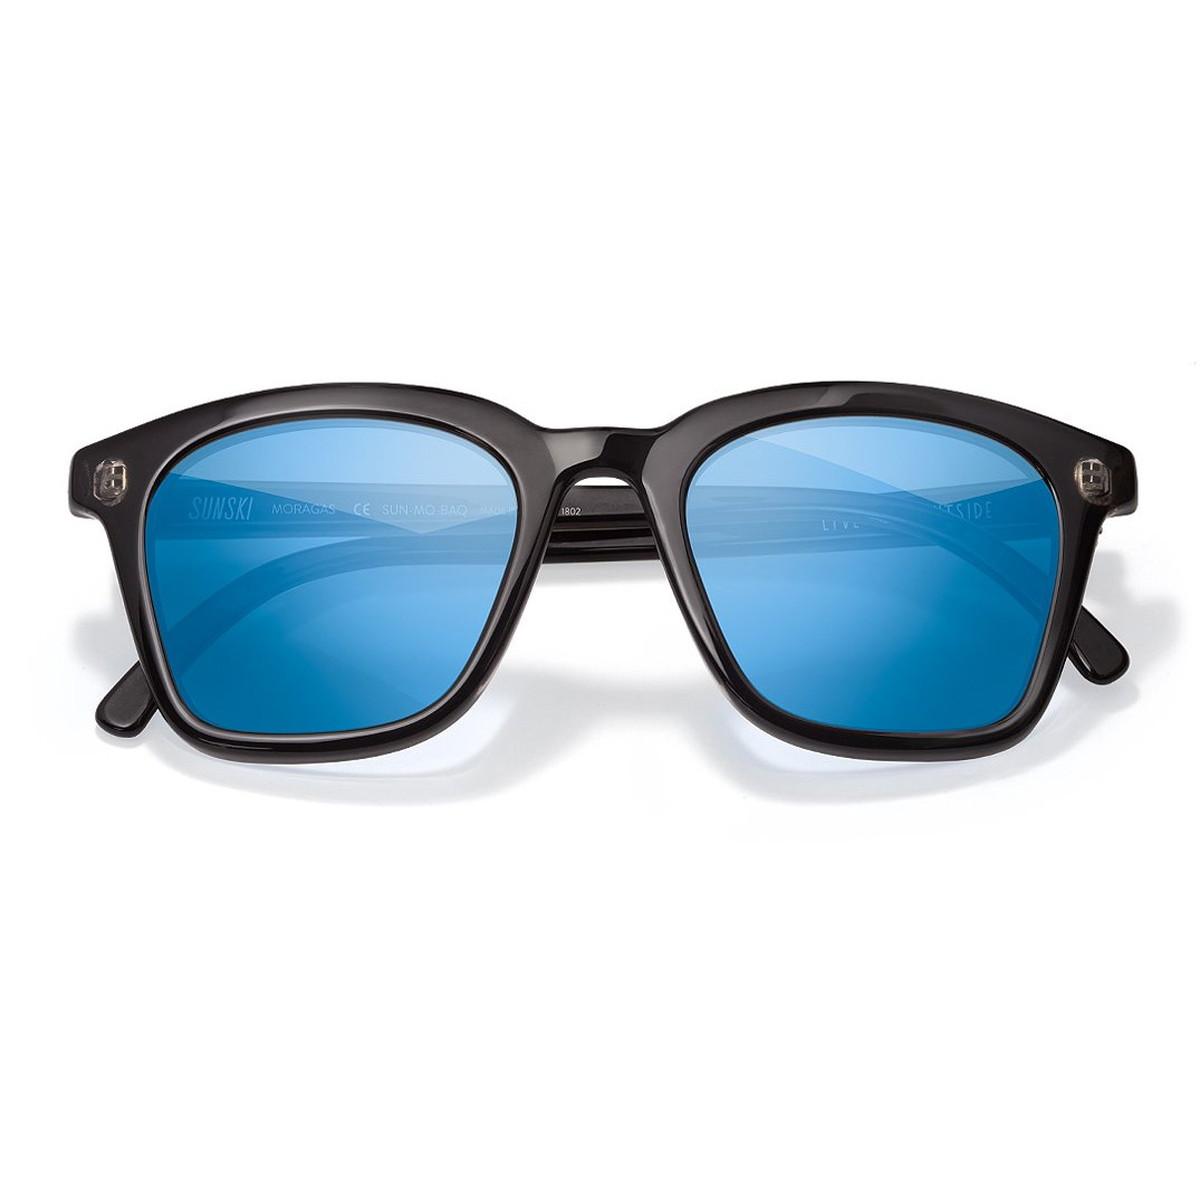 SUNSKI サンスキー Moraga Black Aqua 眼鏡 サングラス